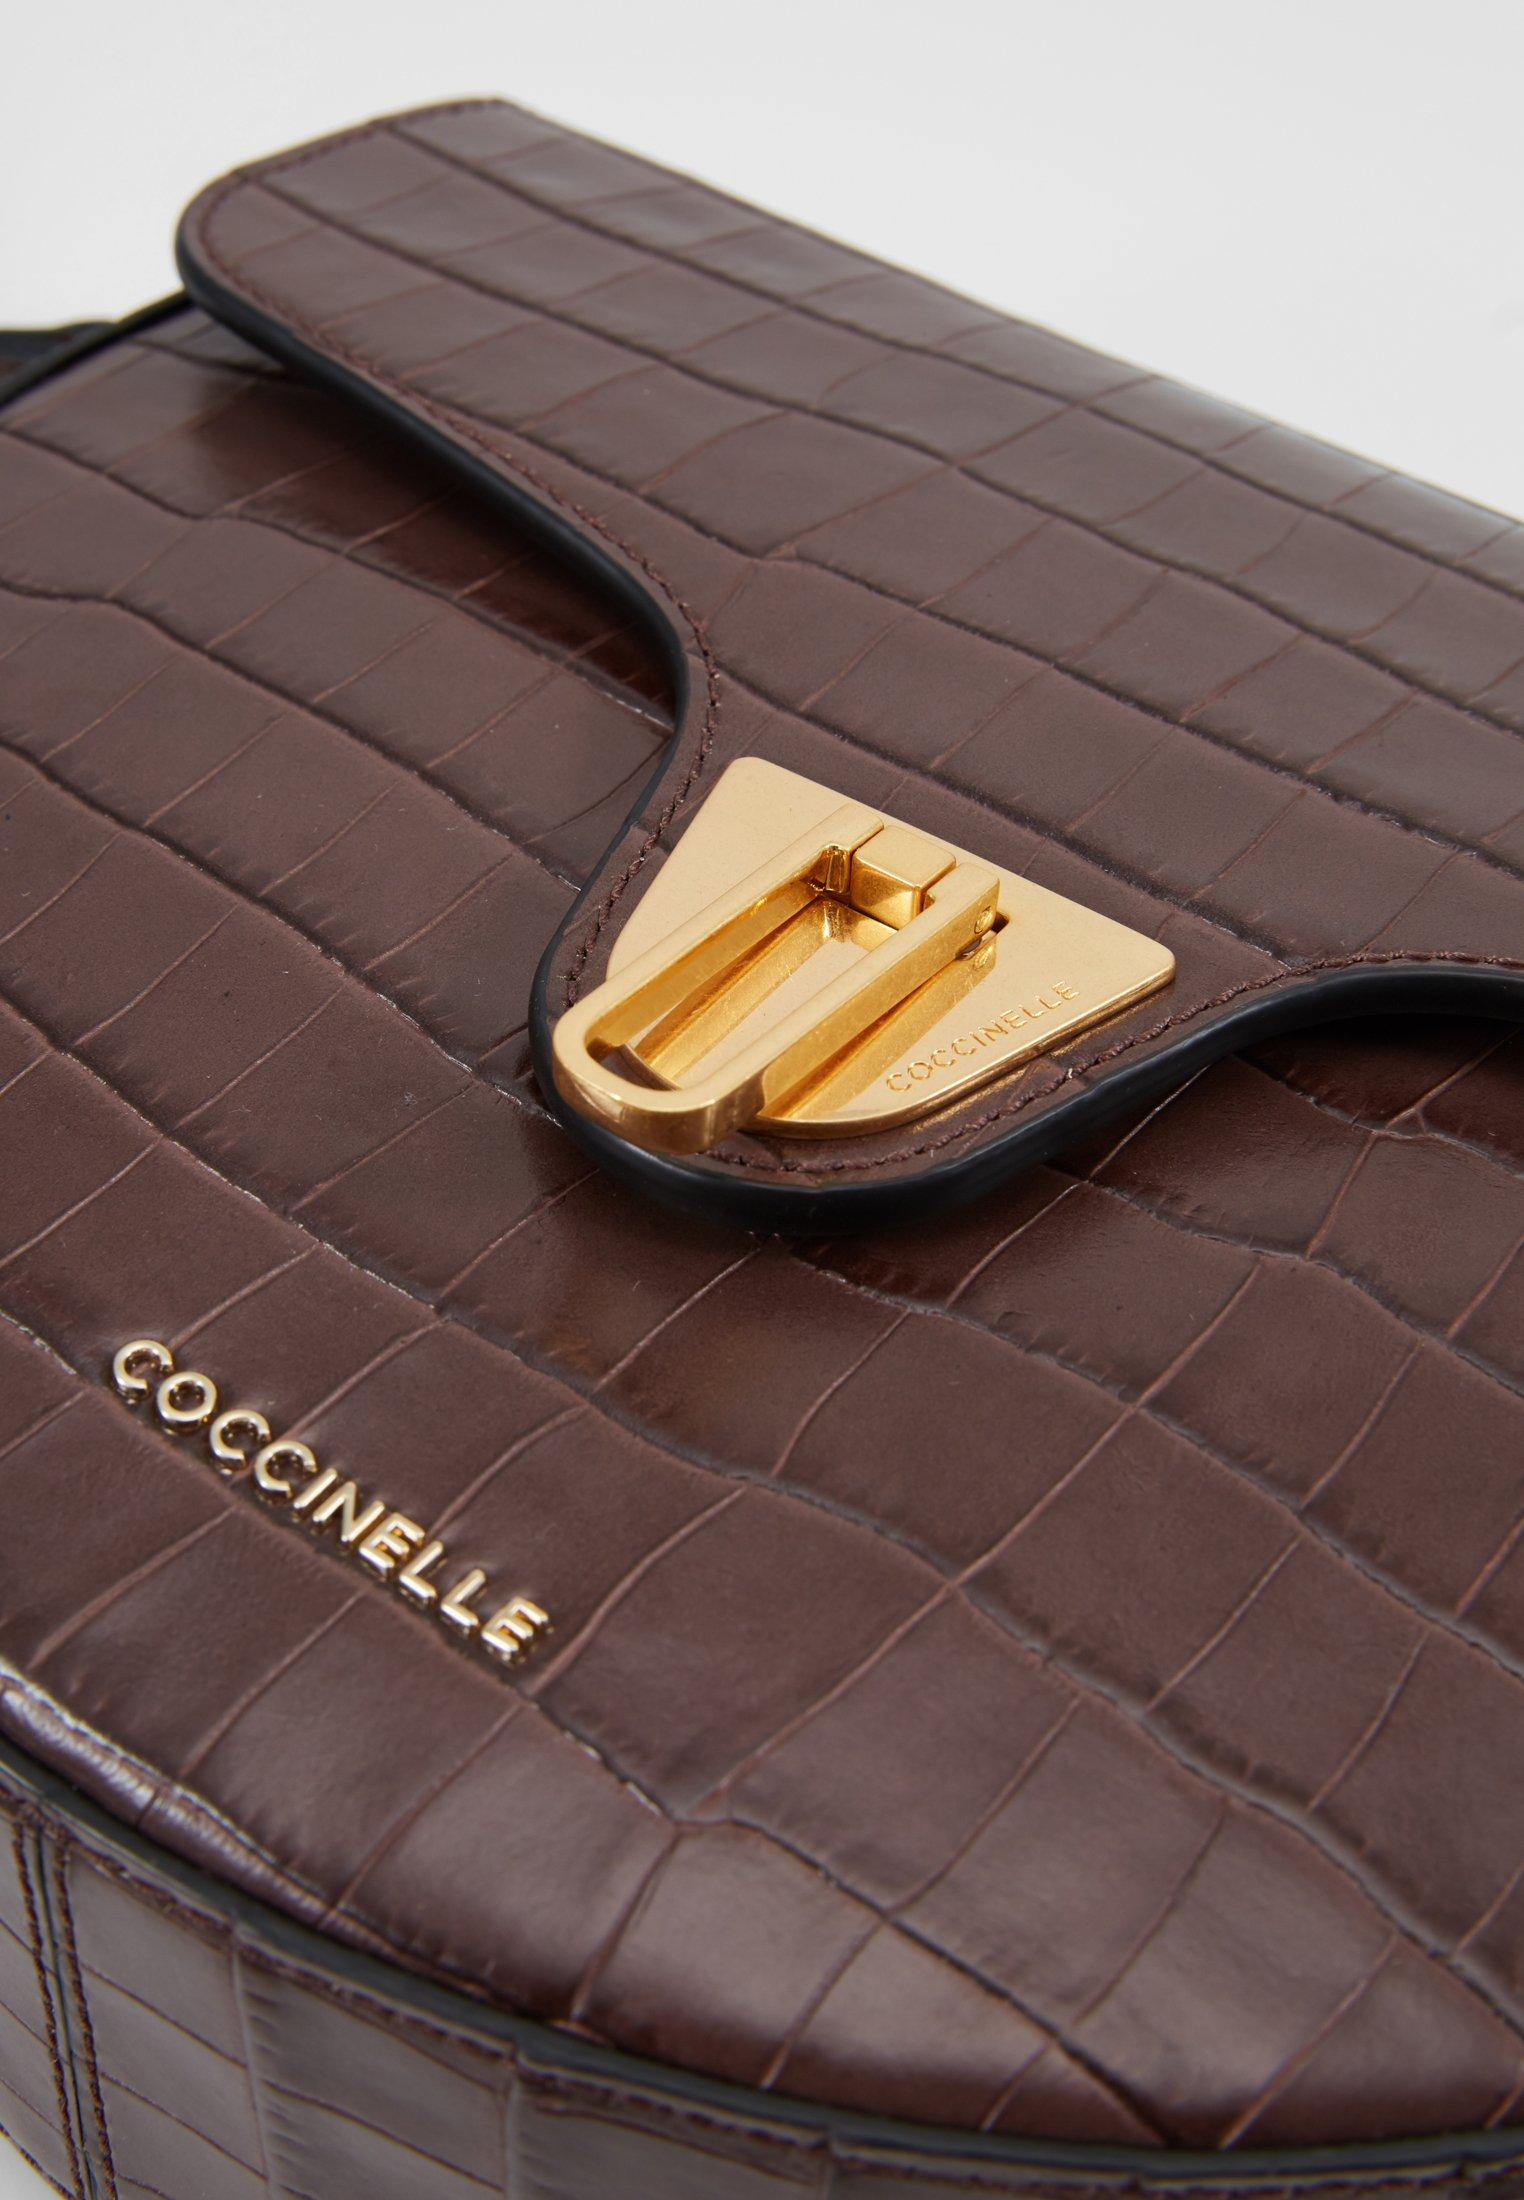 Coccinelle BEAT HALF MOON Skulderveske chocolate